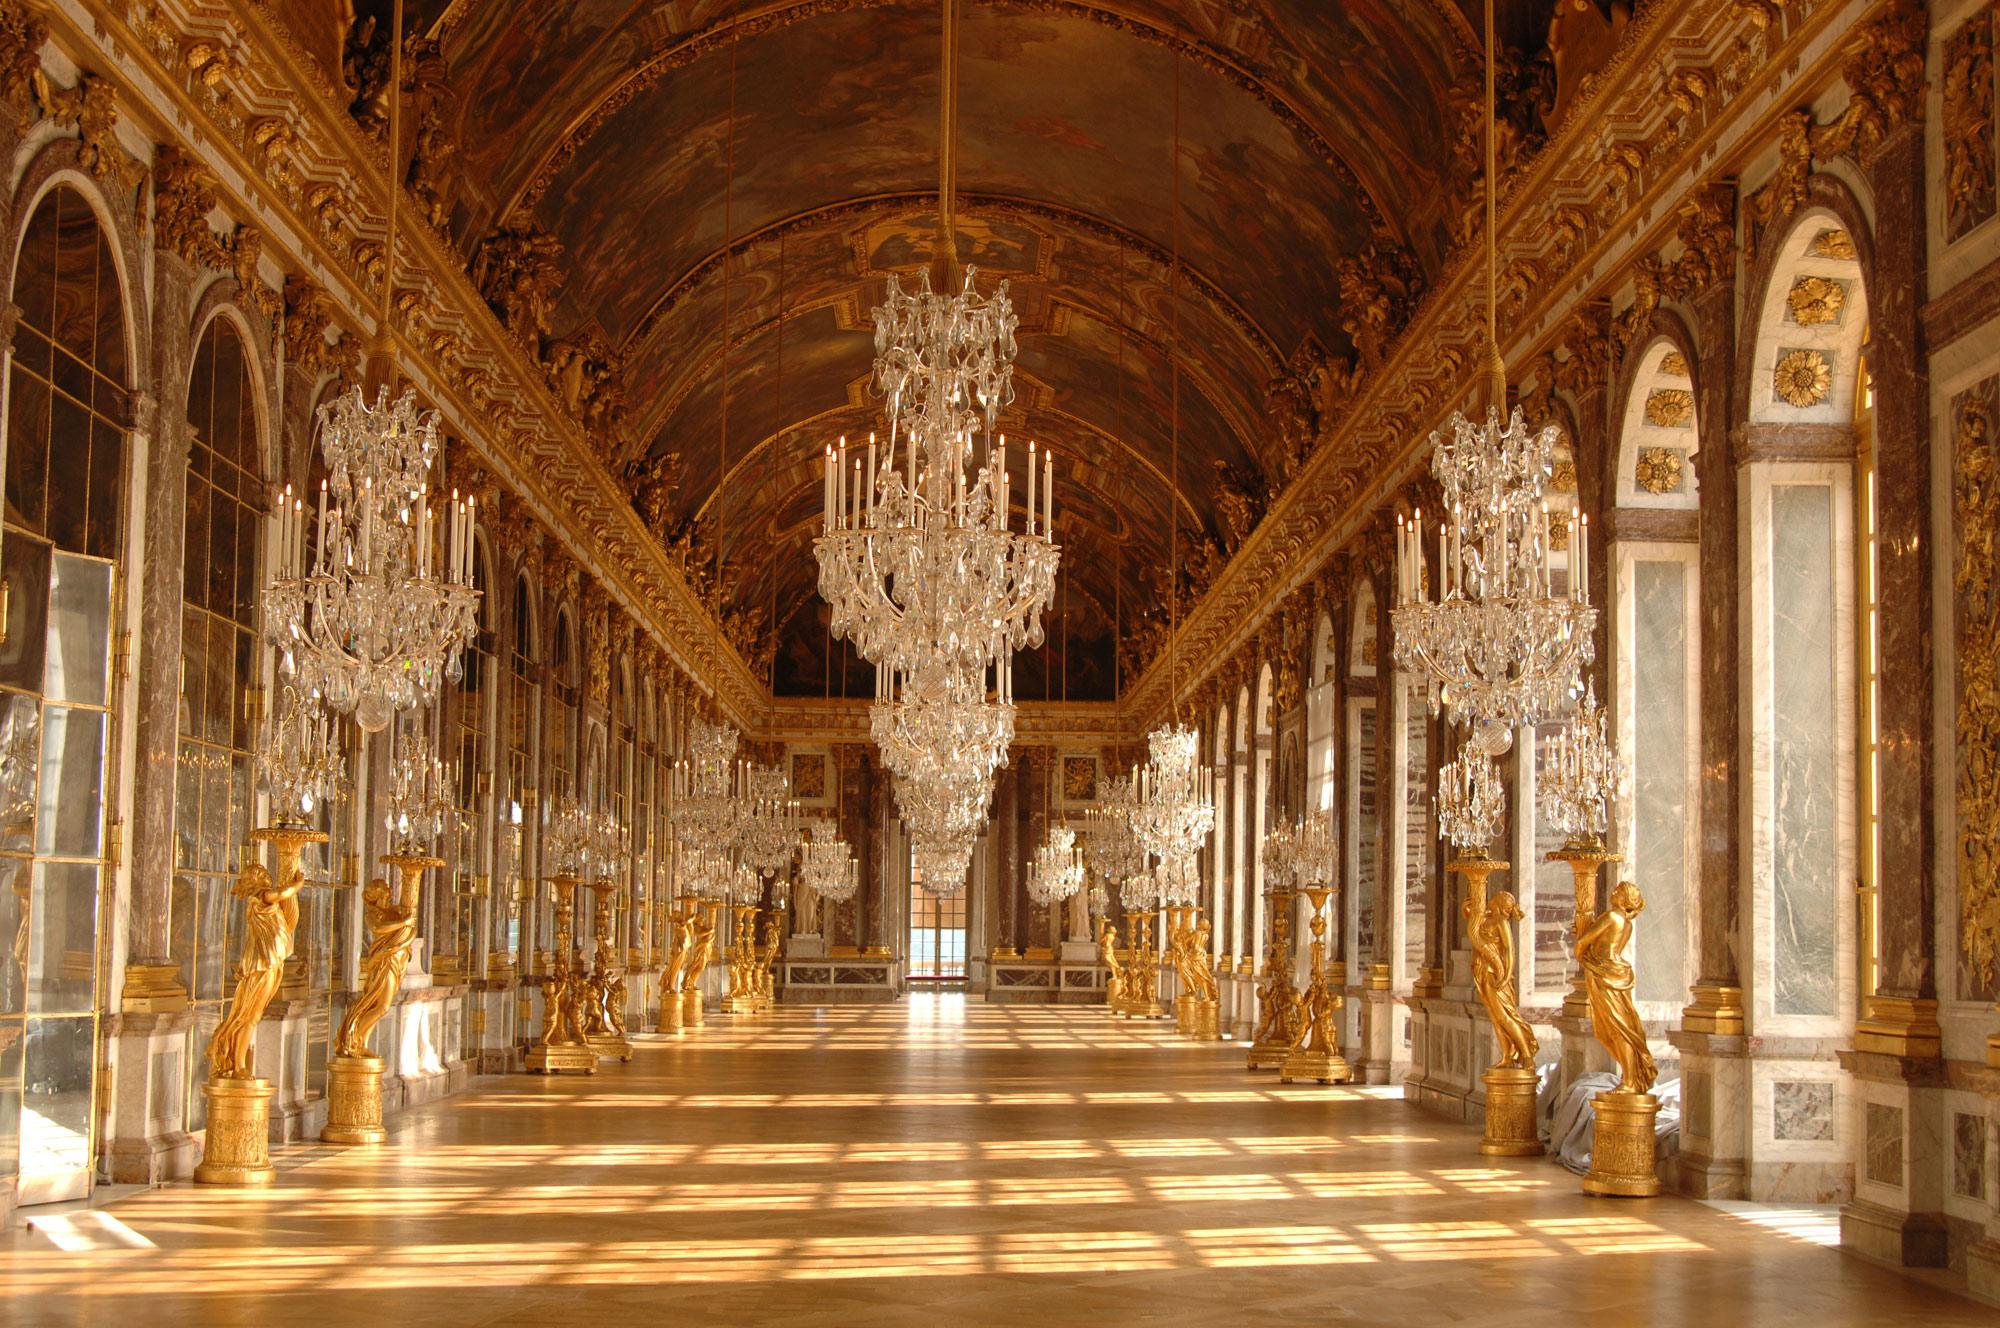 Image:  The Hall of Mirrors, Palace of Versailles   © Jose Ignacio Soto / Shutterstock.com